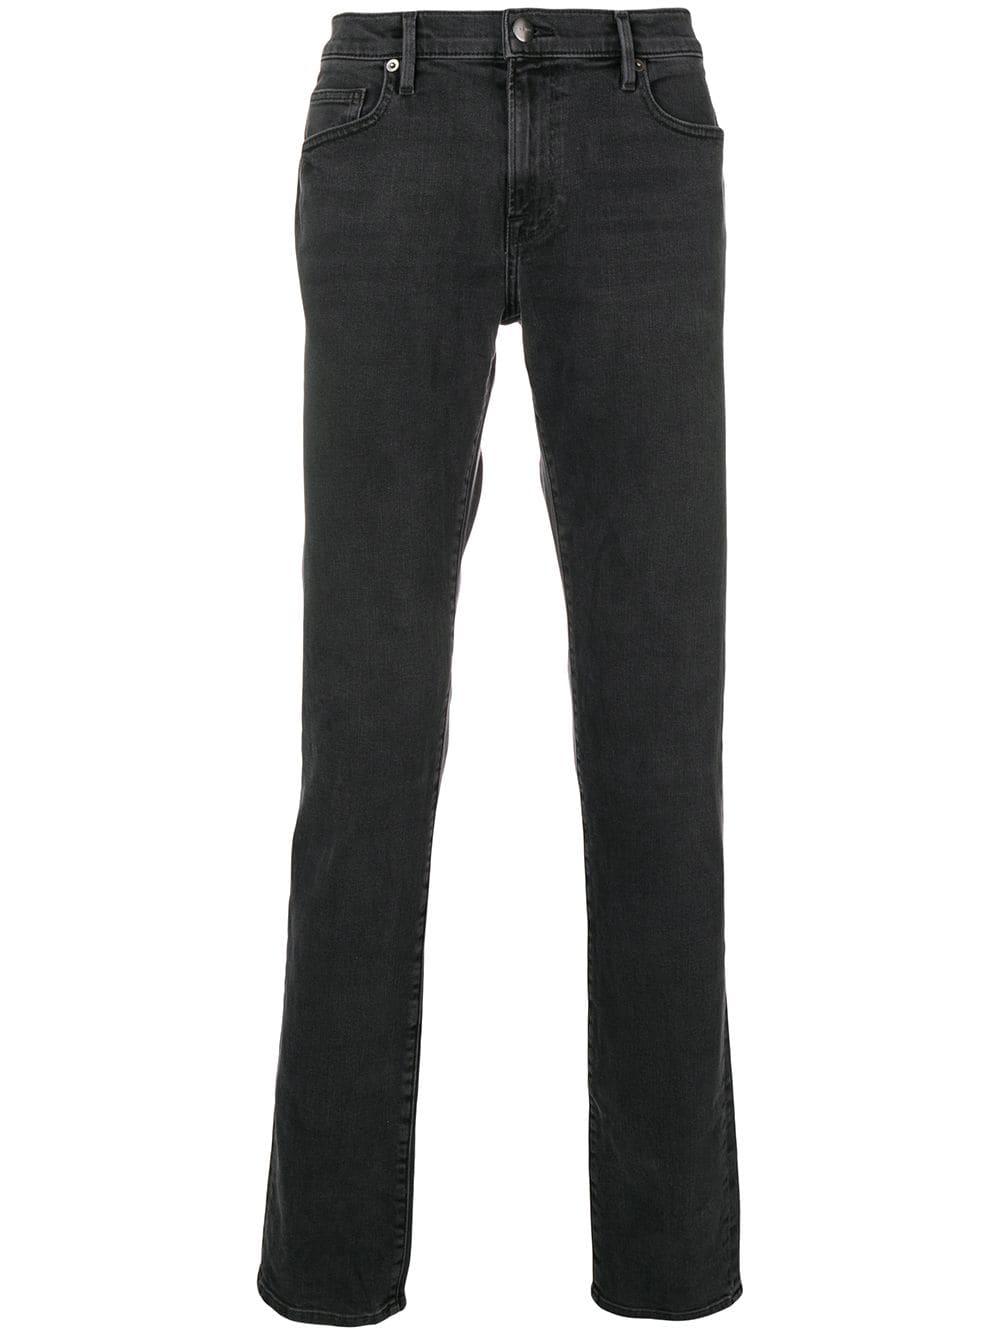 FRAME DENIM Jeans FRAME DENIM | Jeans | LMHK795BFDTGRGY